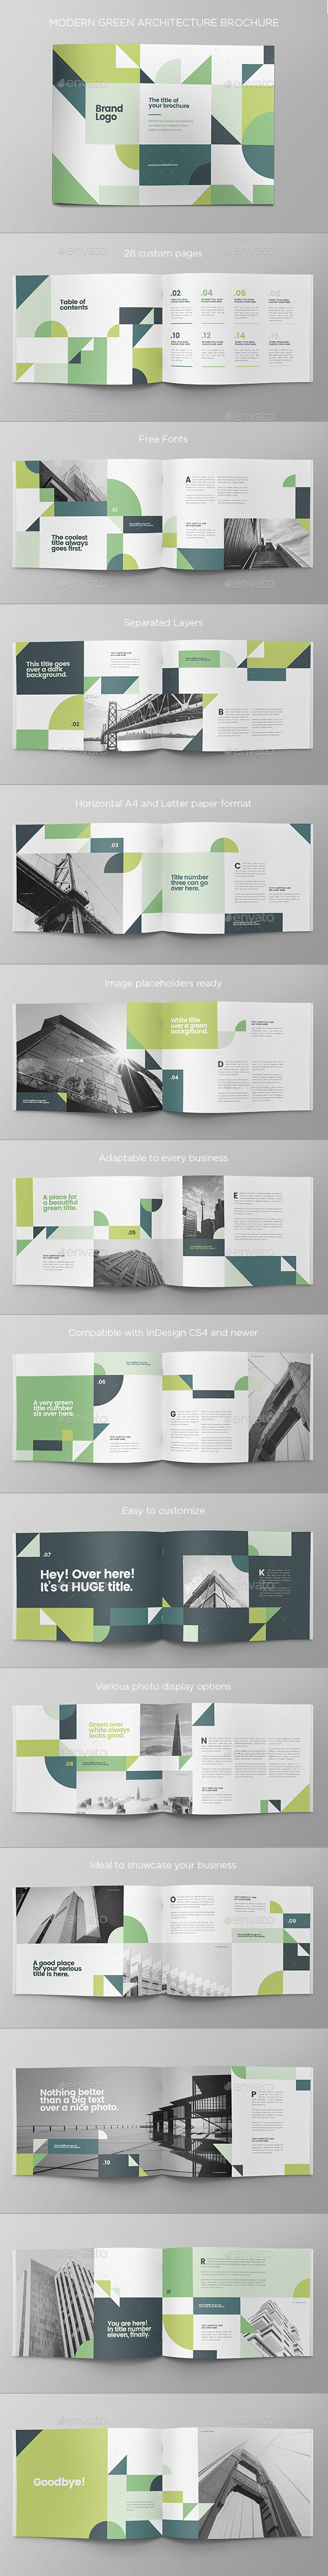 Modern Green Architecture Brochure - Brochures Print Templates